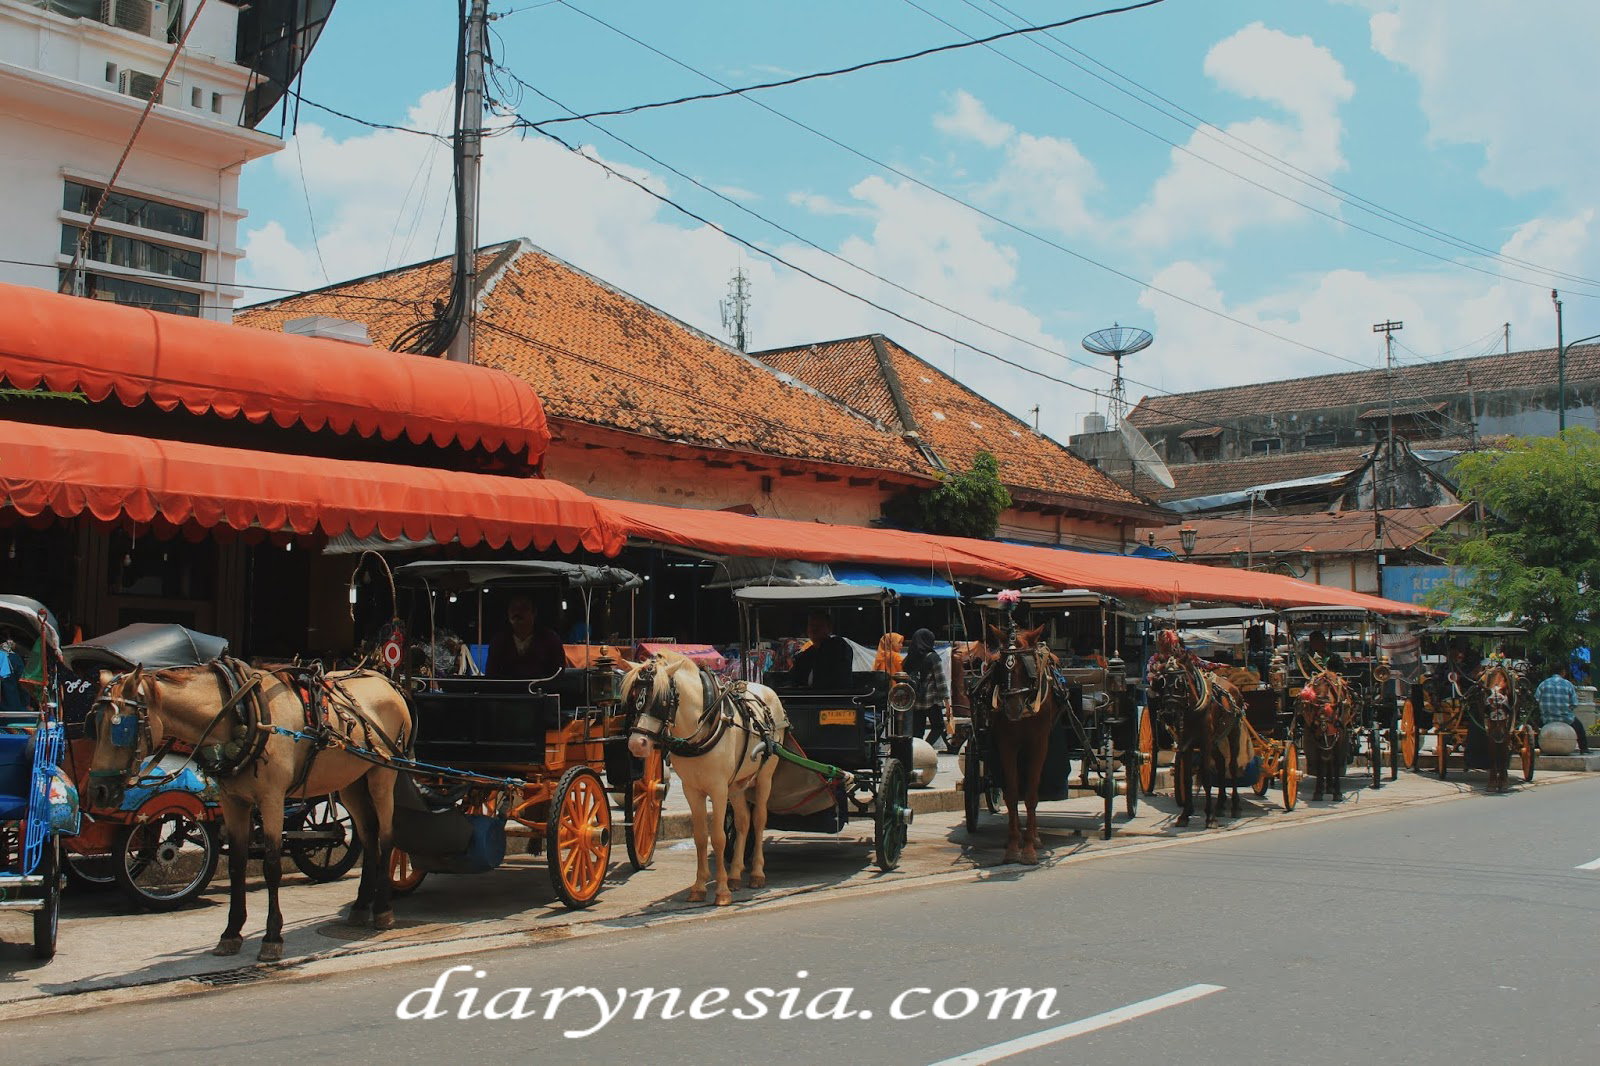 Best Yogyakarta souvenirs and gift, must buy in yogyakarta, Authentic things to buy in yogyakarta, diarynesia